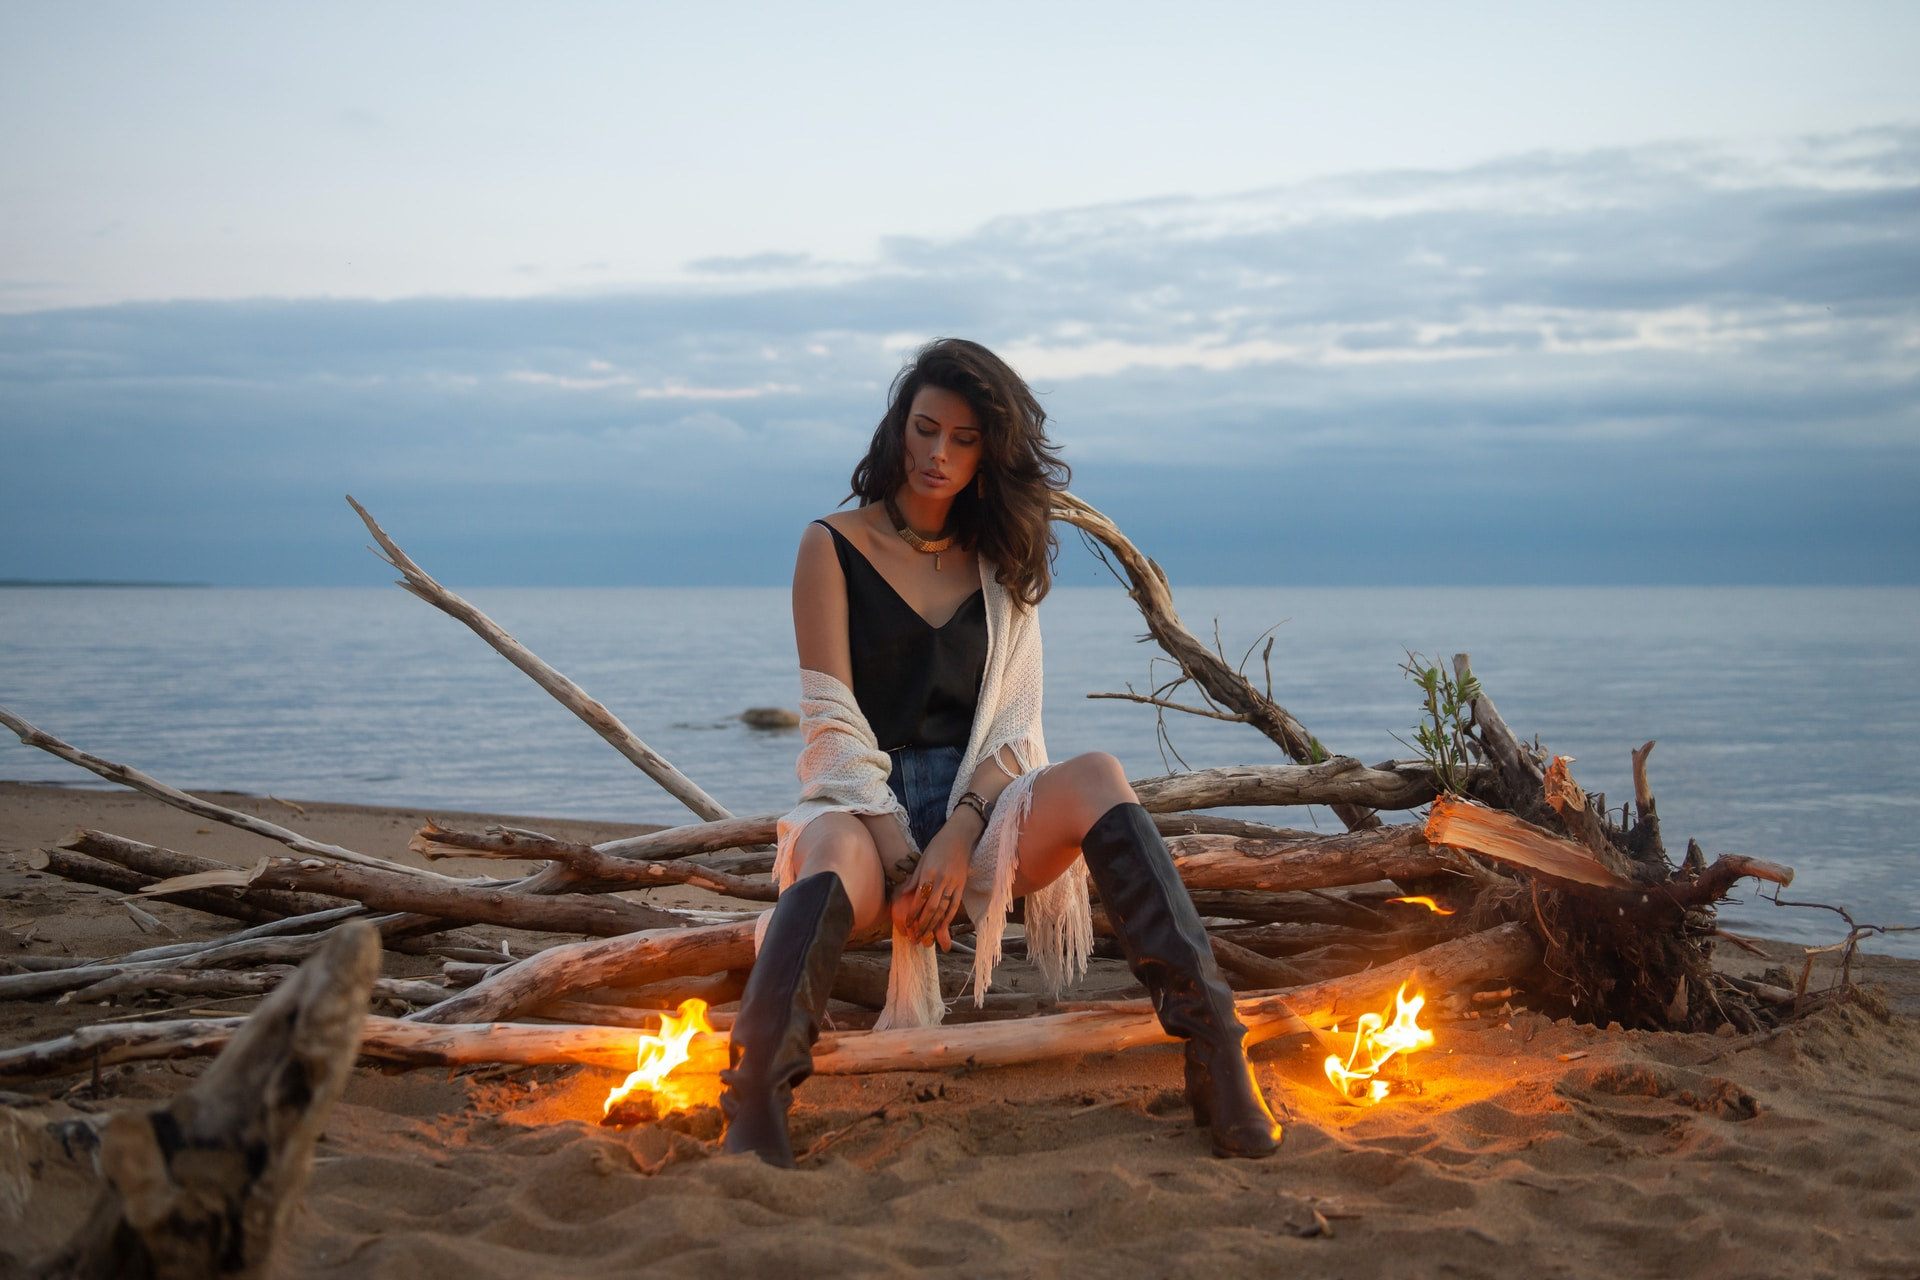 woman in white tank top sitting on brown log near bonfire during daytime